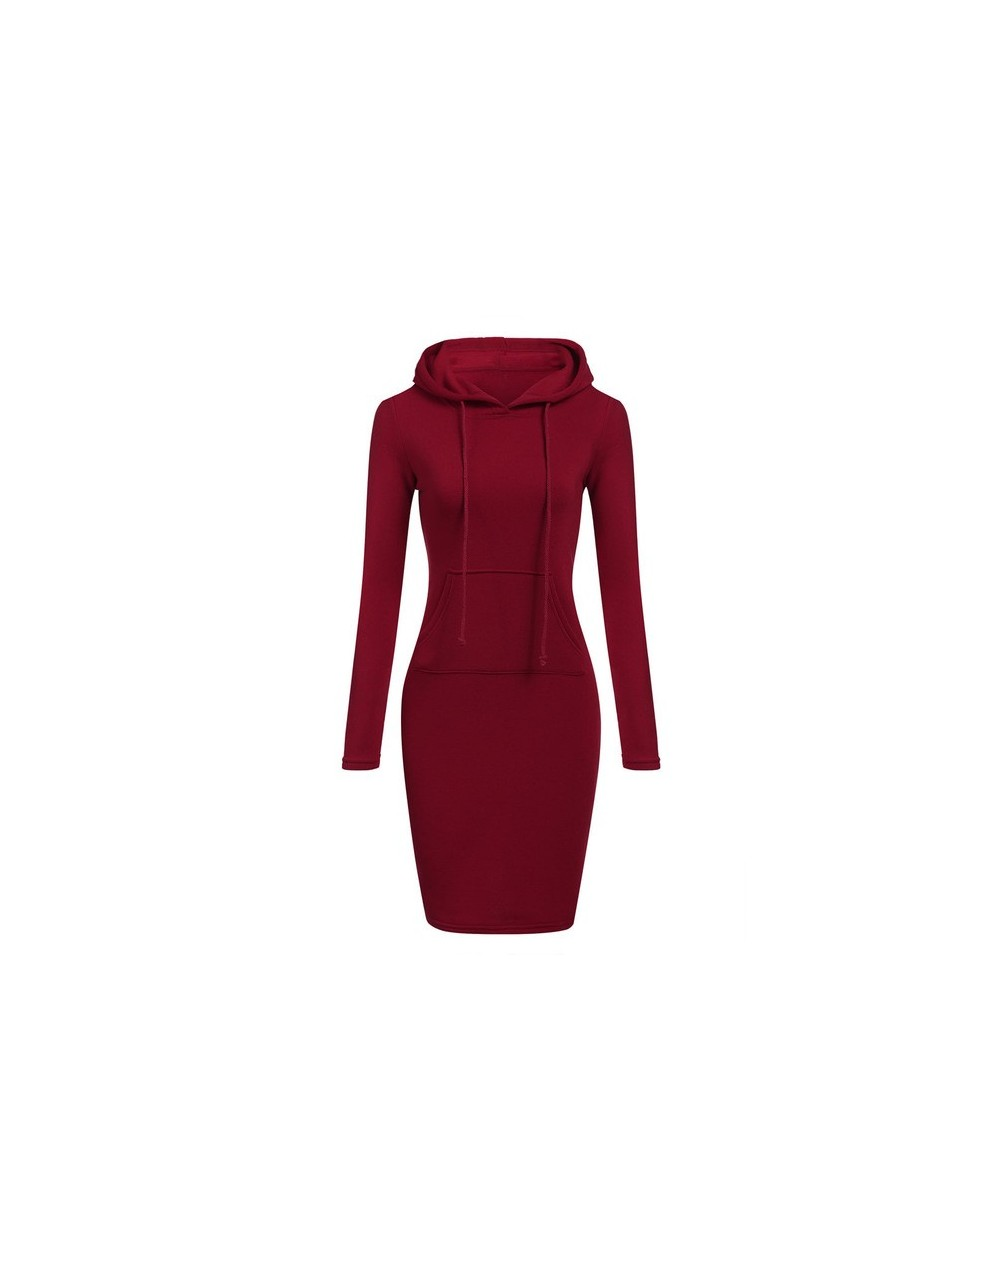 2017 Autumn Winter Women Hoodies Long Sweatshirts Patchwork Fashion FemalePullovers Hoodie Tops Causal Plus Size Feminino Co...